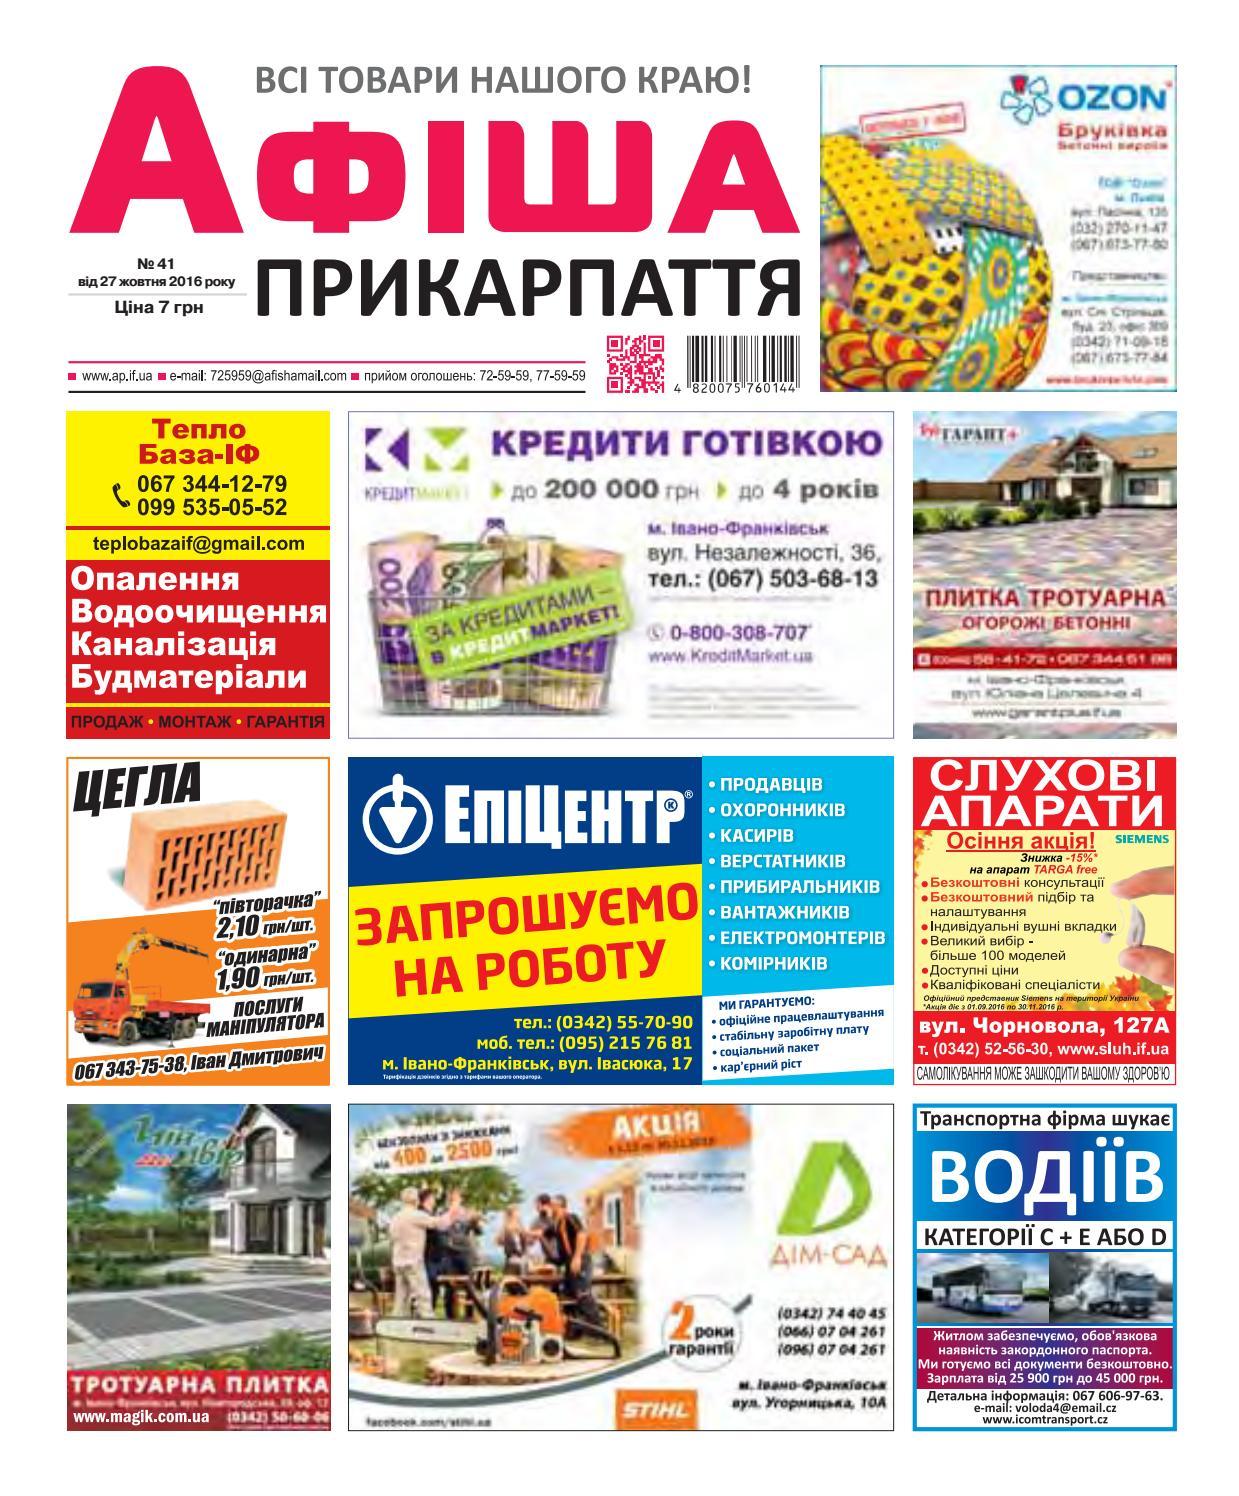 Афіша Прикарпаття №41 by Olya Olya - issuu 2b54a412cb24e